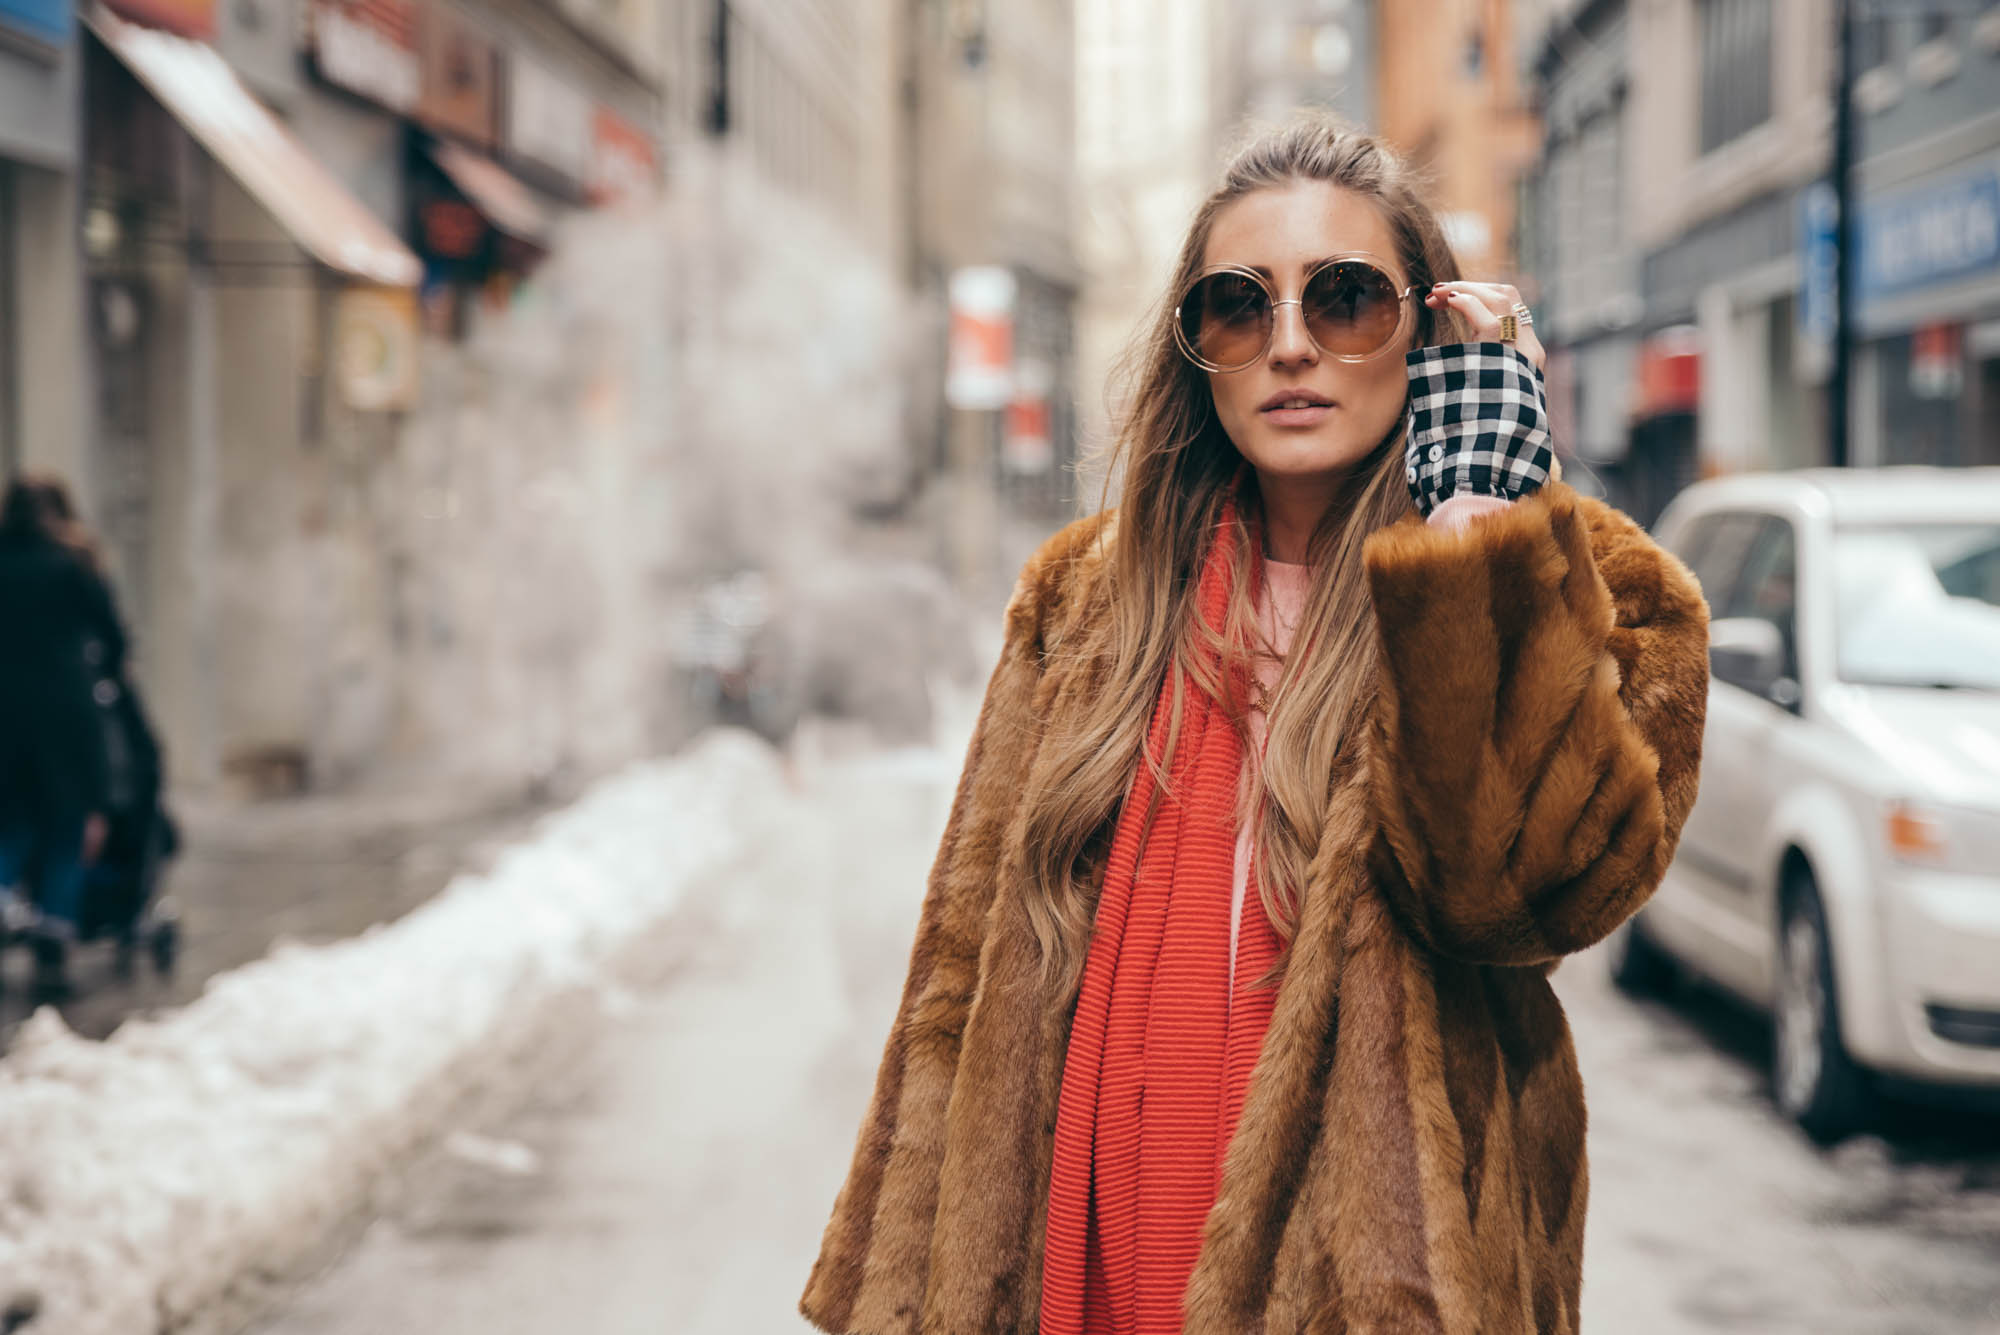 Streets of New York | Lisa Fiege